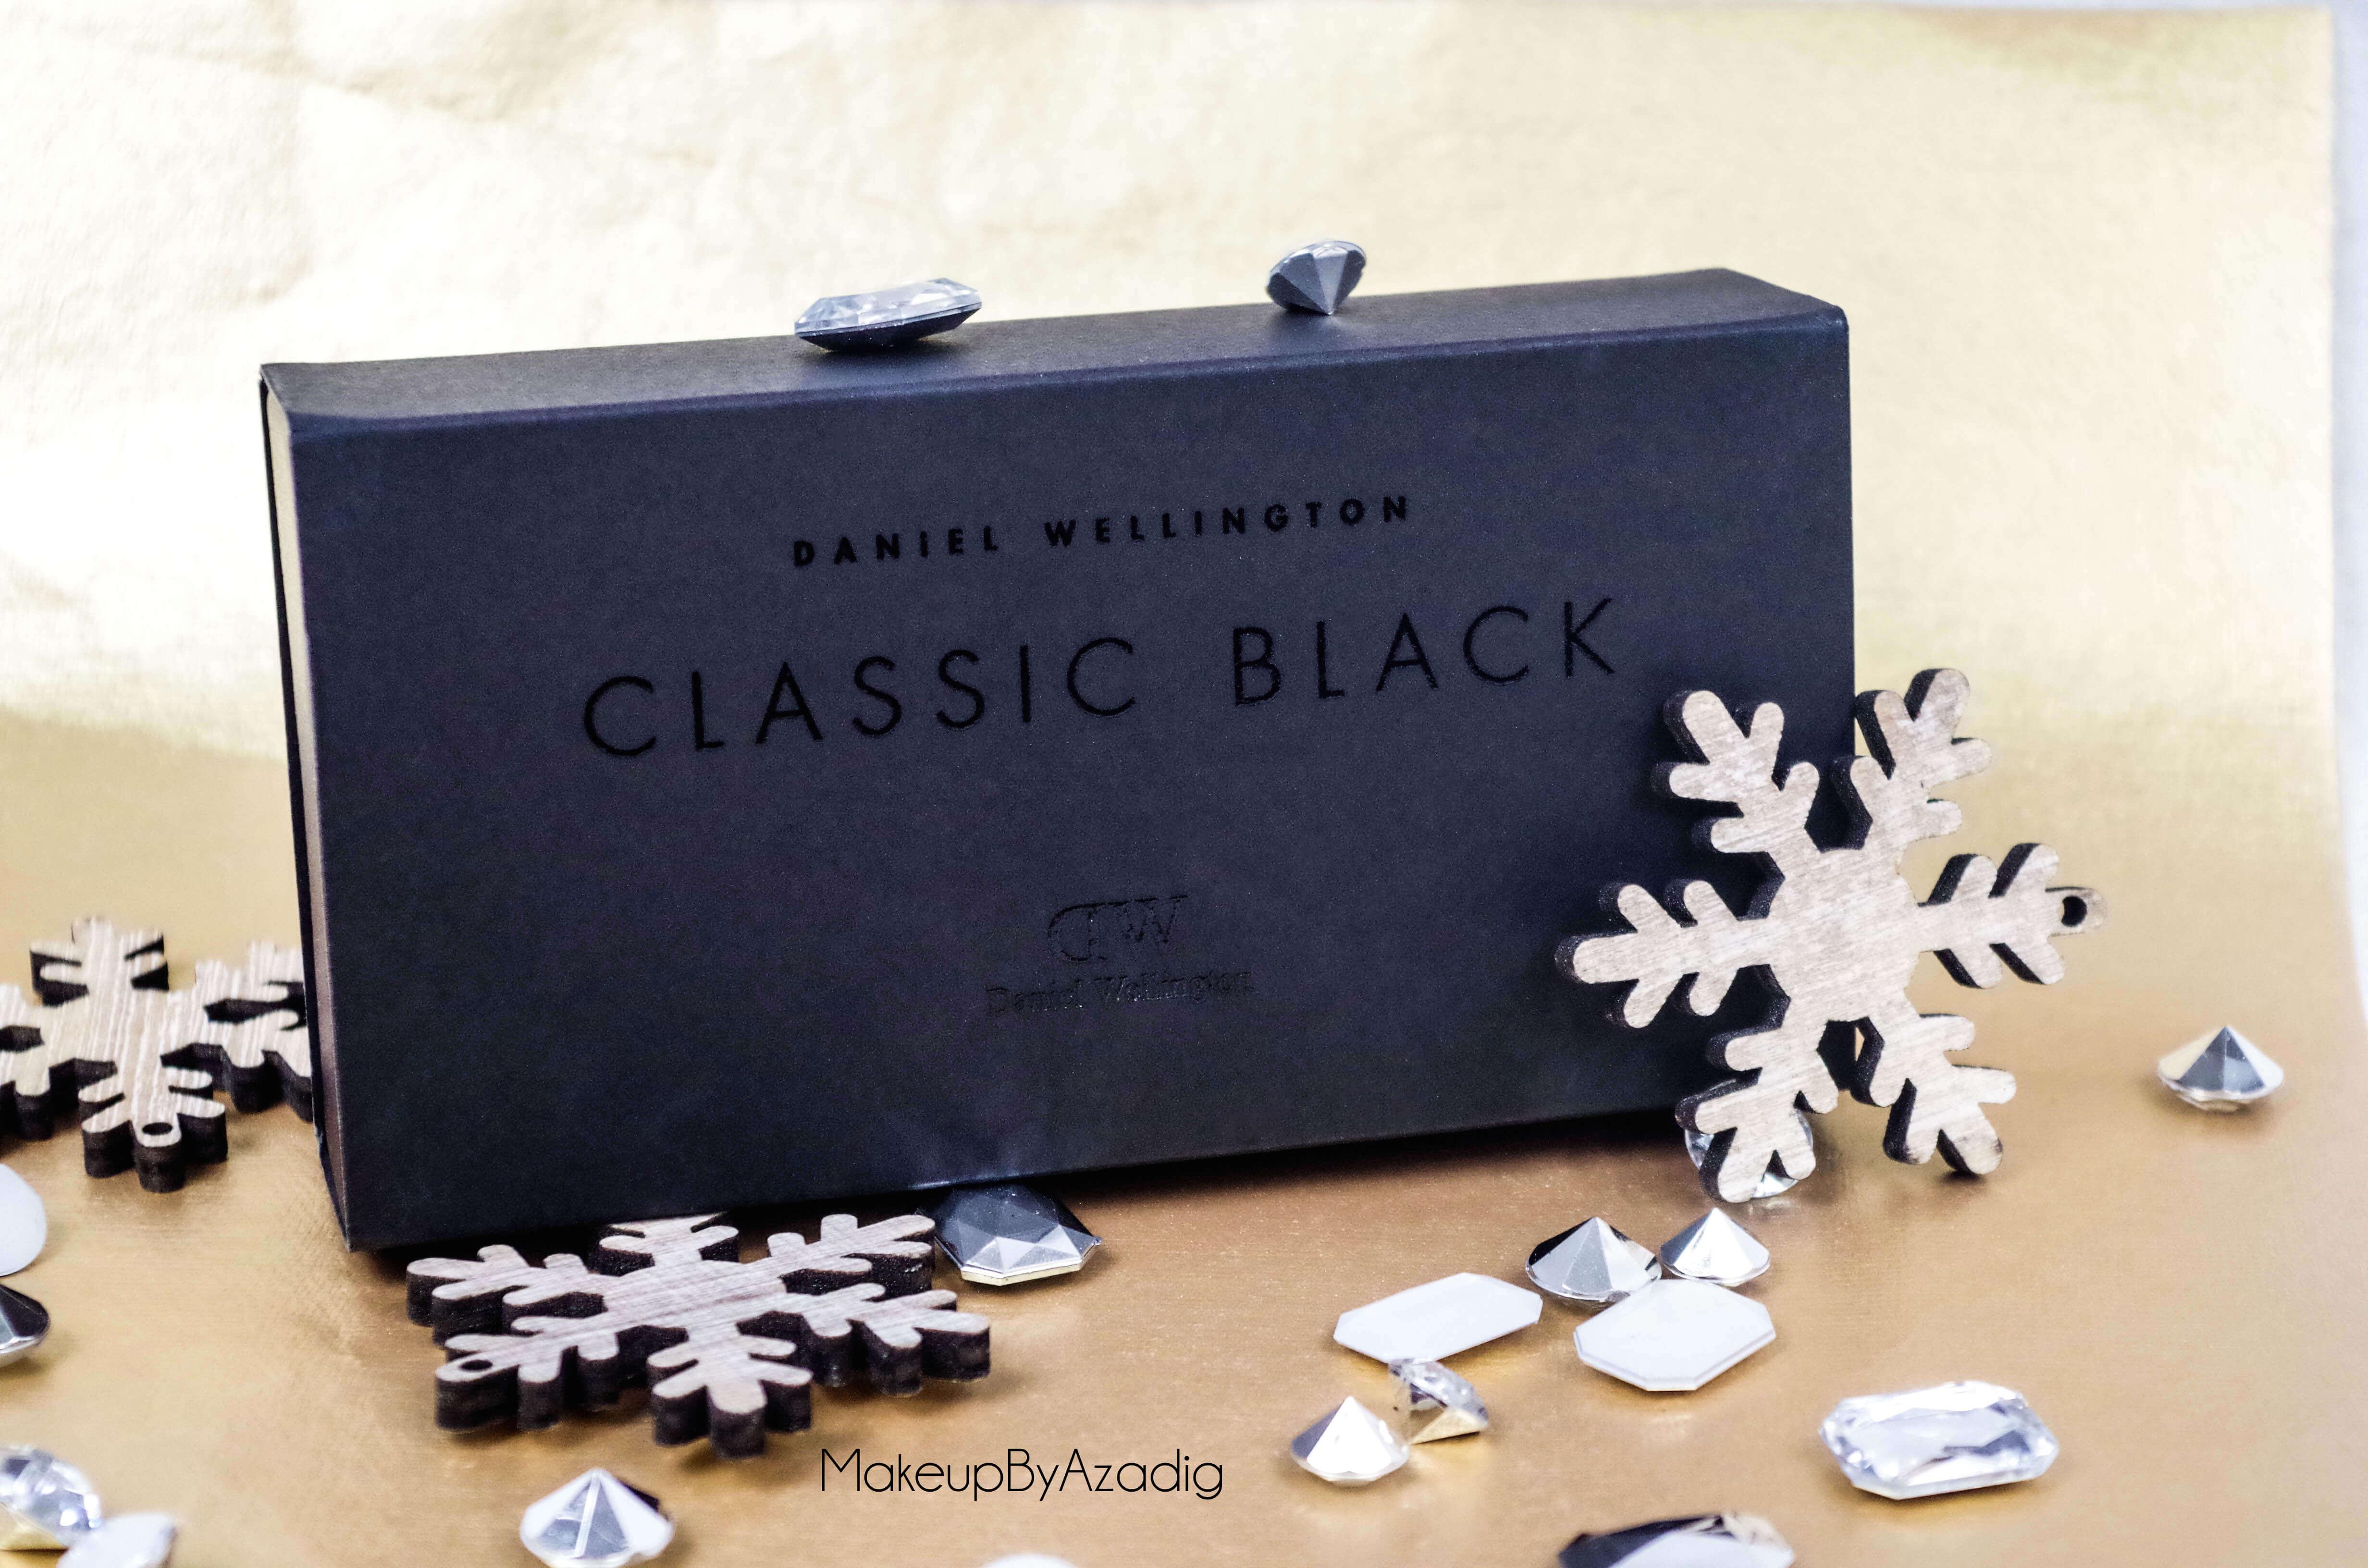 makeupbyazadig-daniel-wellington-montre-classic-black-sheffield-code-promo-troyes-paris-carton